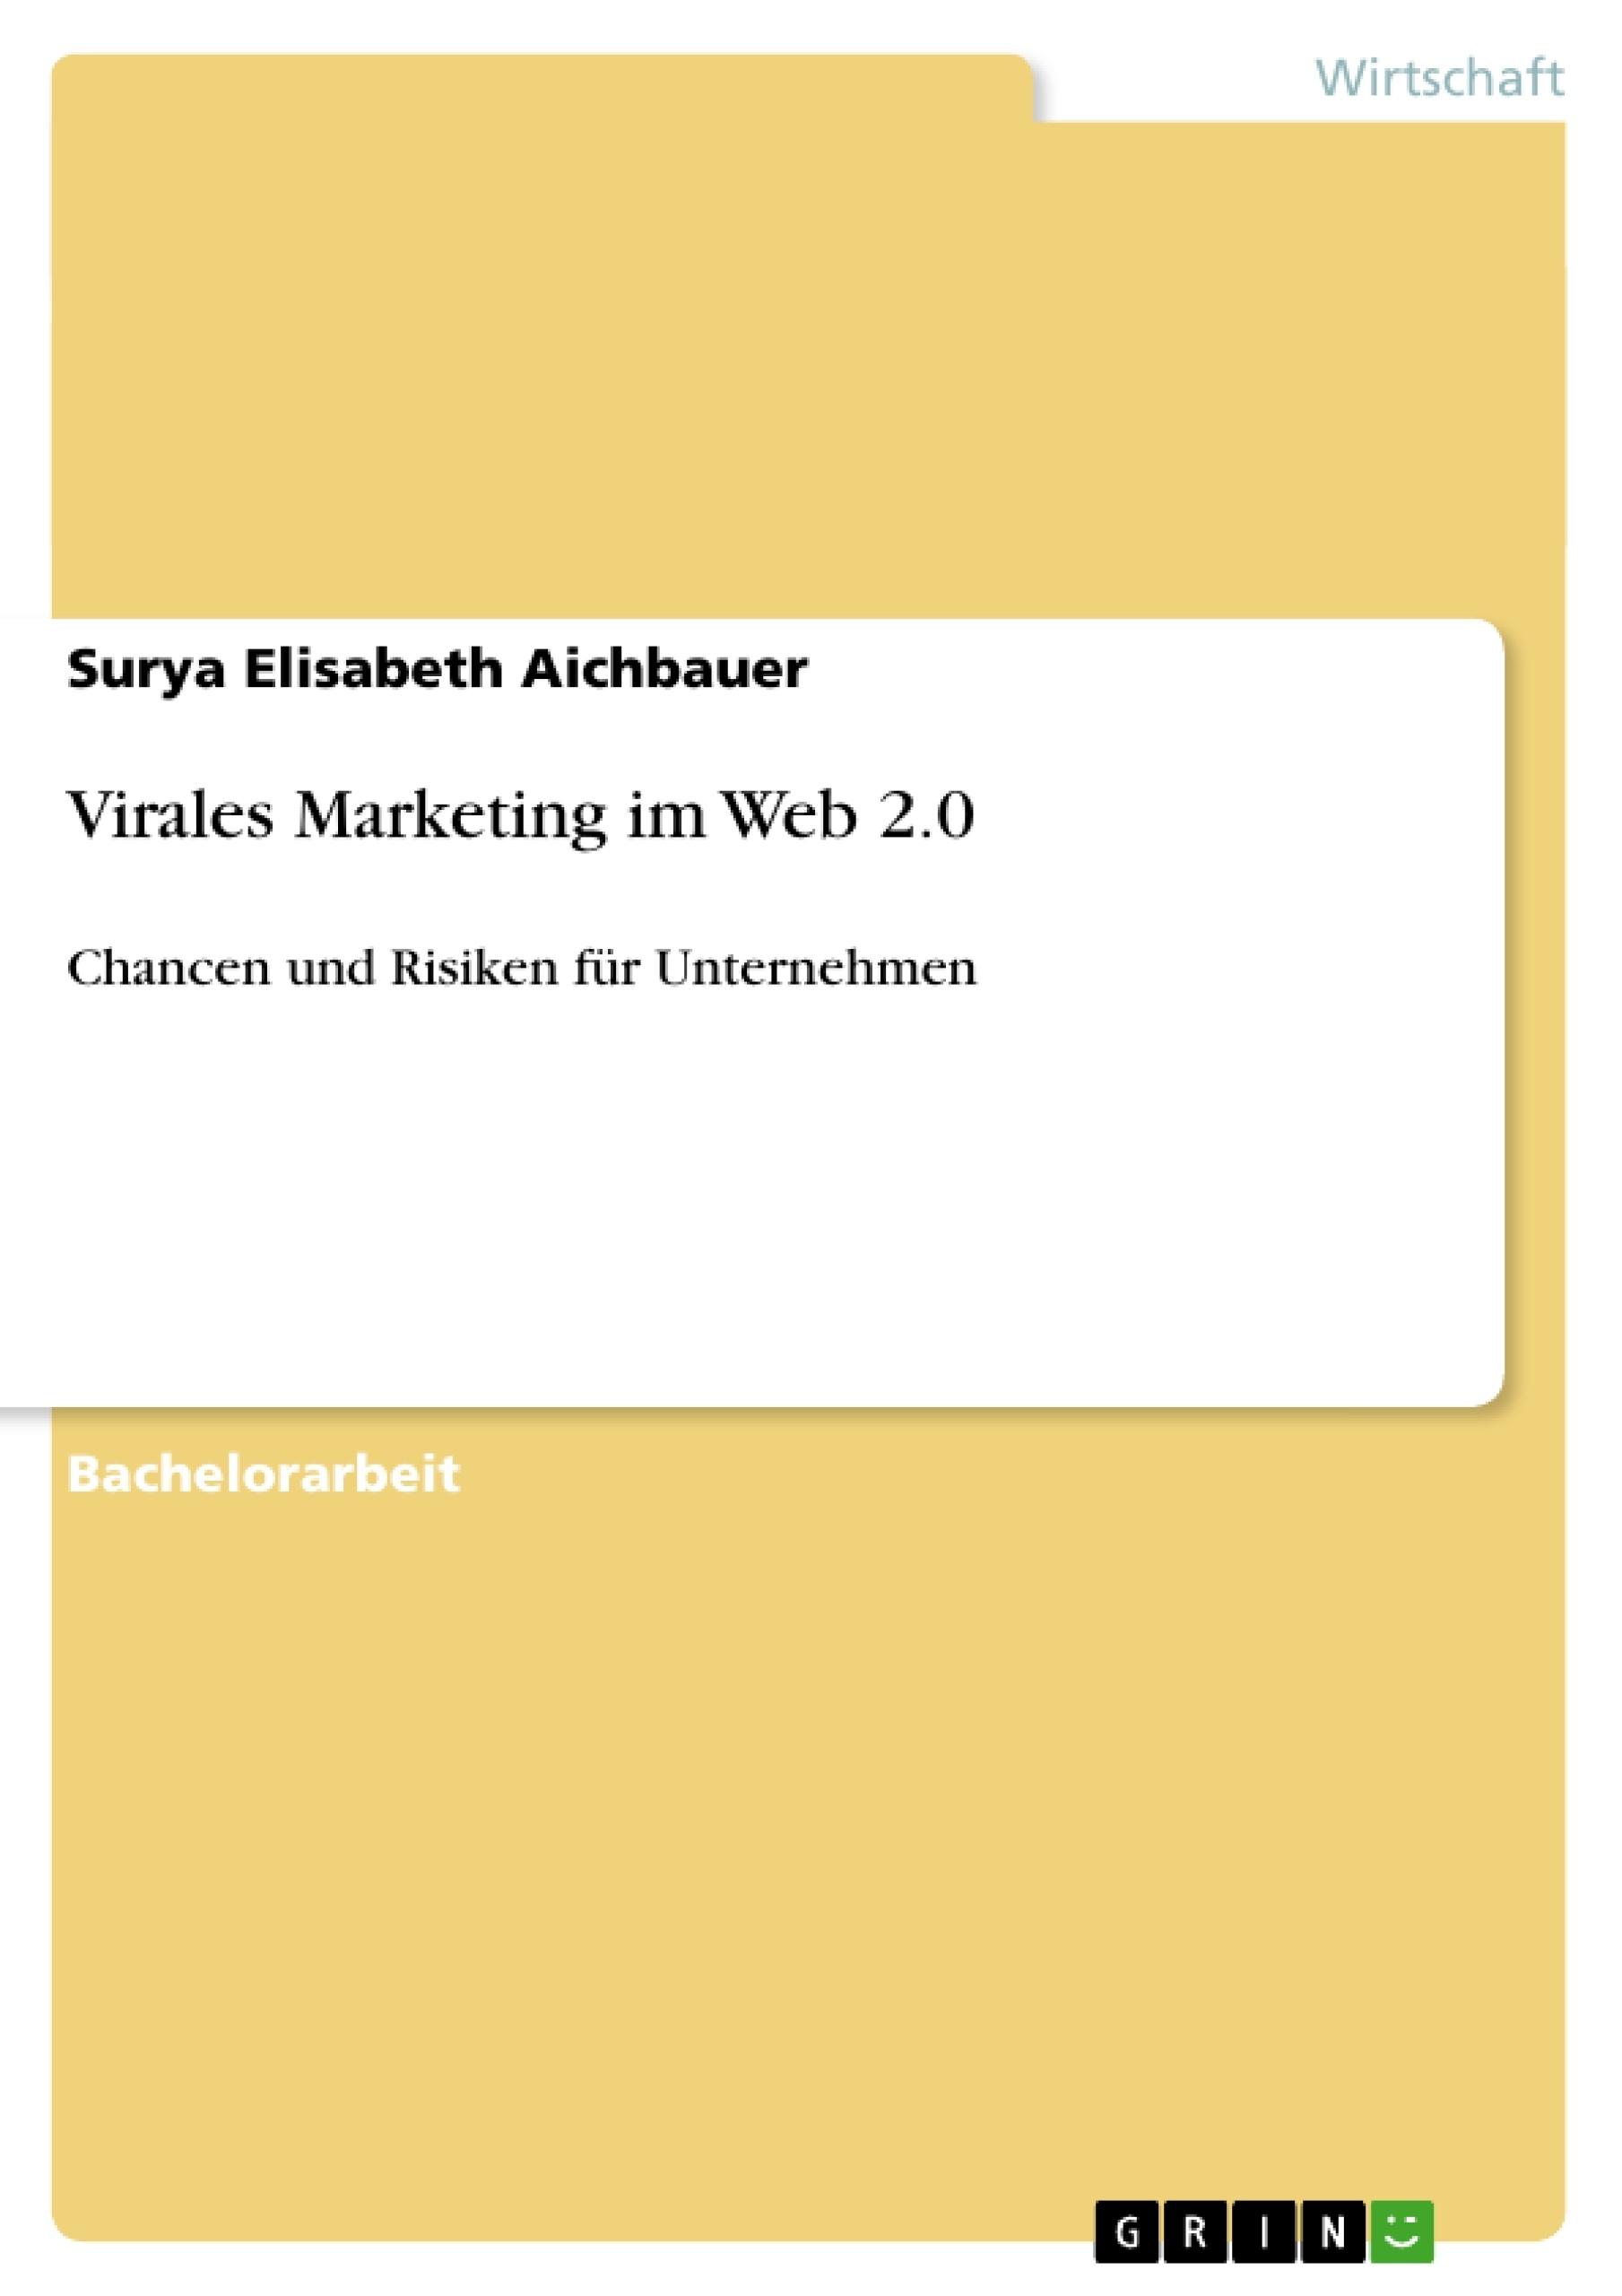 Titel: Virales Marketing im Web 2.0